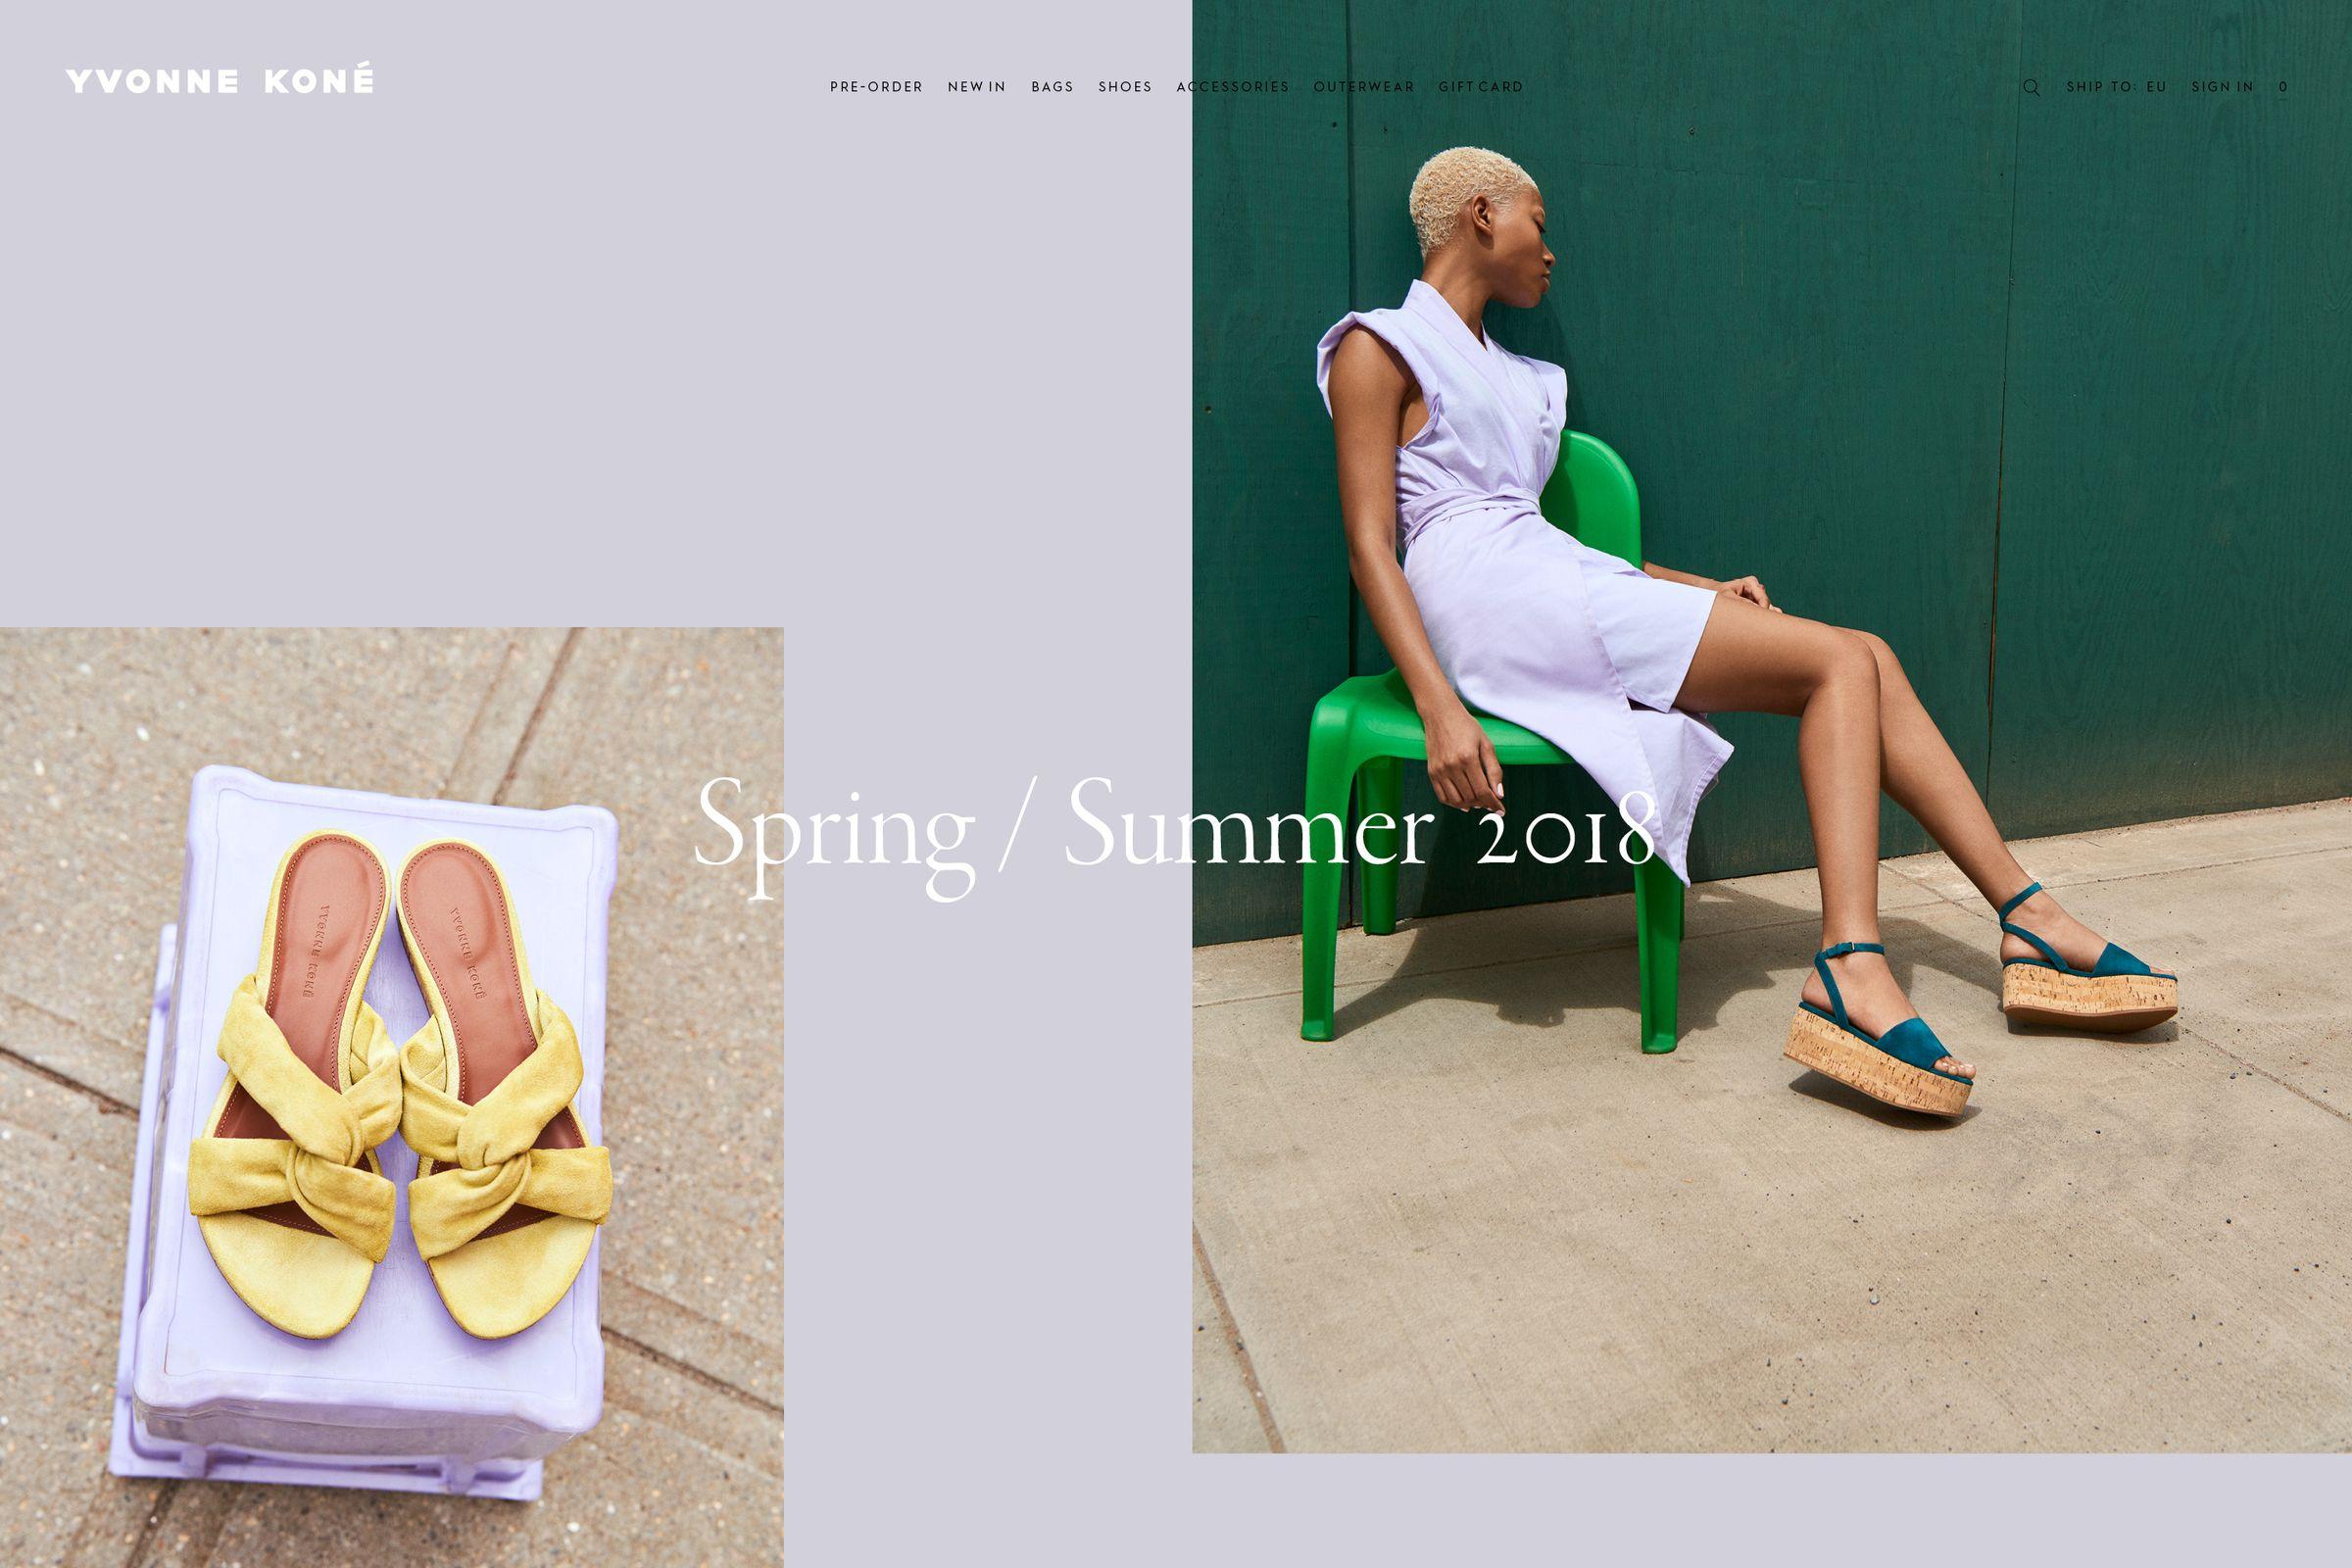 Yvonne Kone website design for homepage